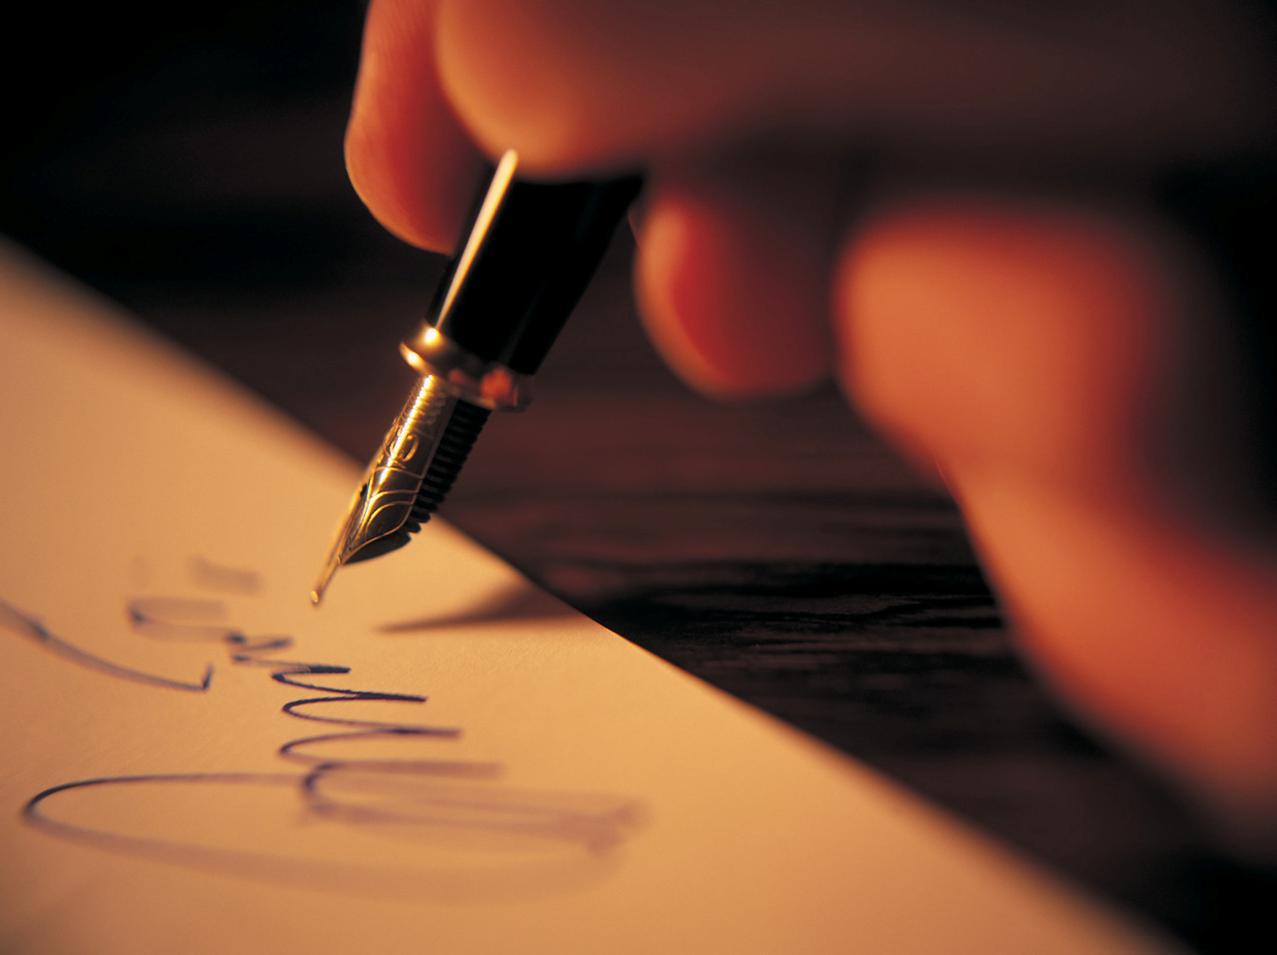 http://4.bp.blogspot.com/_yjdnYfPZ-6I/TP5IXWKChzI/AAAAAAAAALg/twA0p03MrNU/s1600/writing-with-pen.jpg